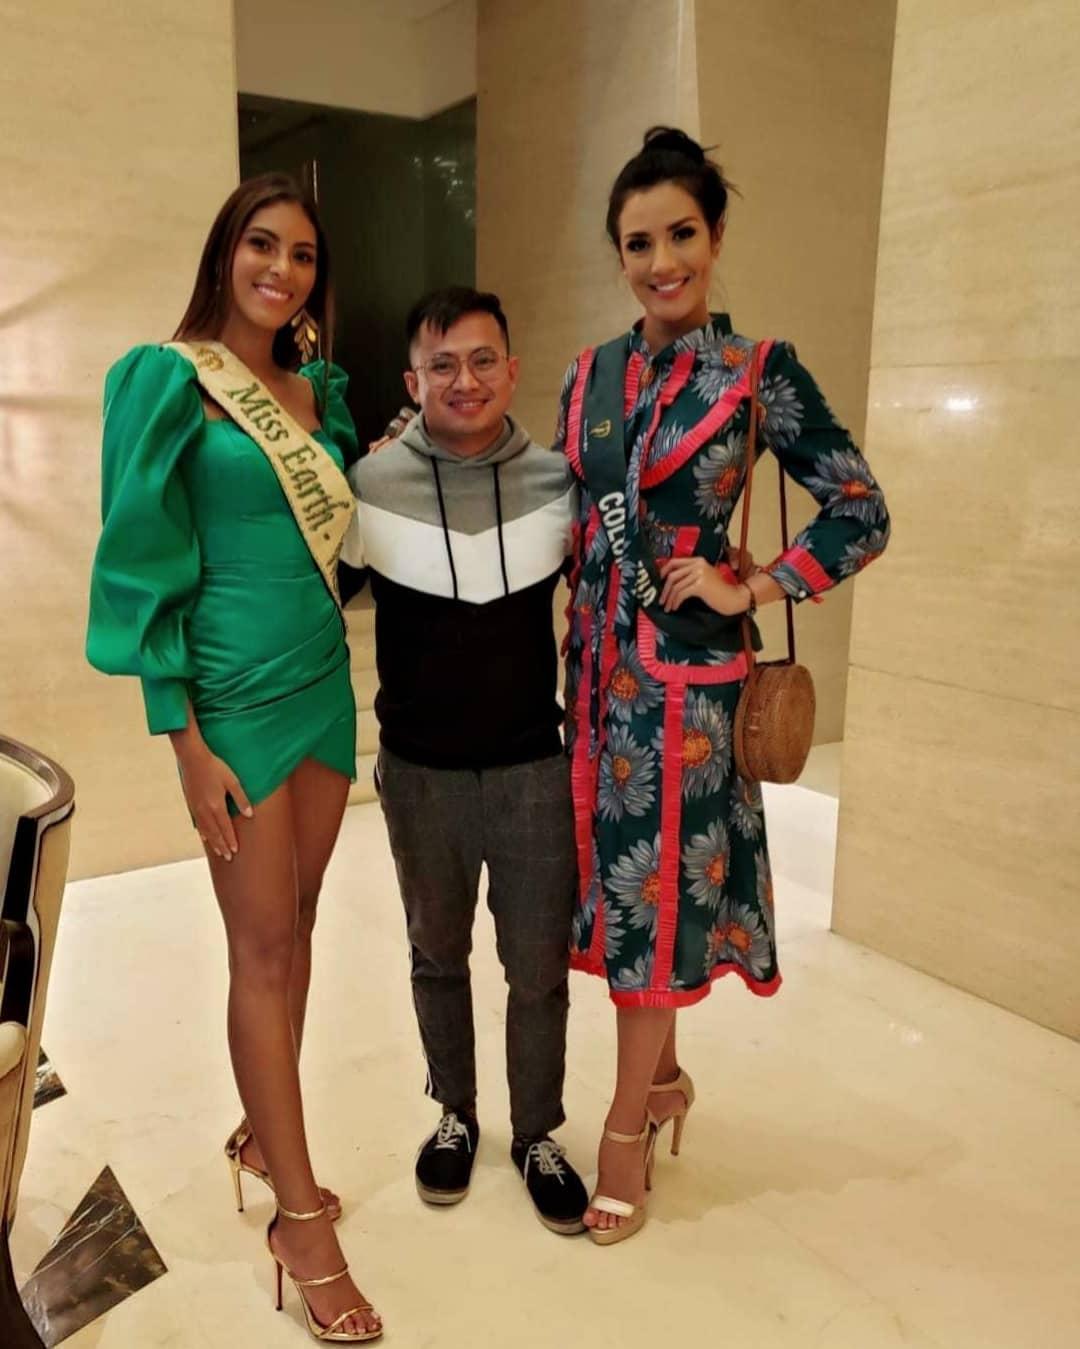 yenny katherine carrillo, top 20 de miss earth 2019/reyna mundial banano 2017. - Página 14 72584110